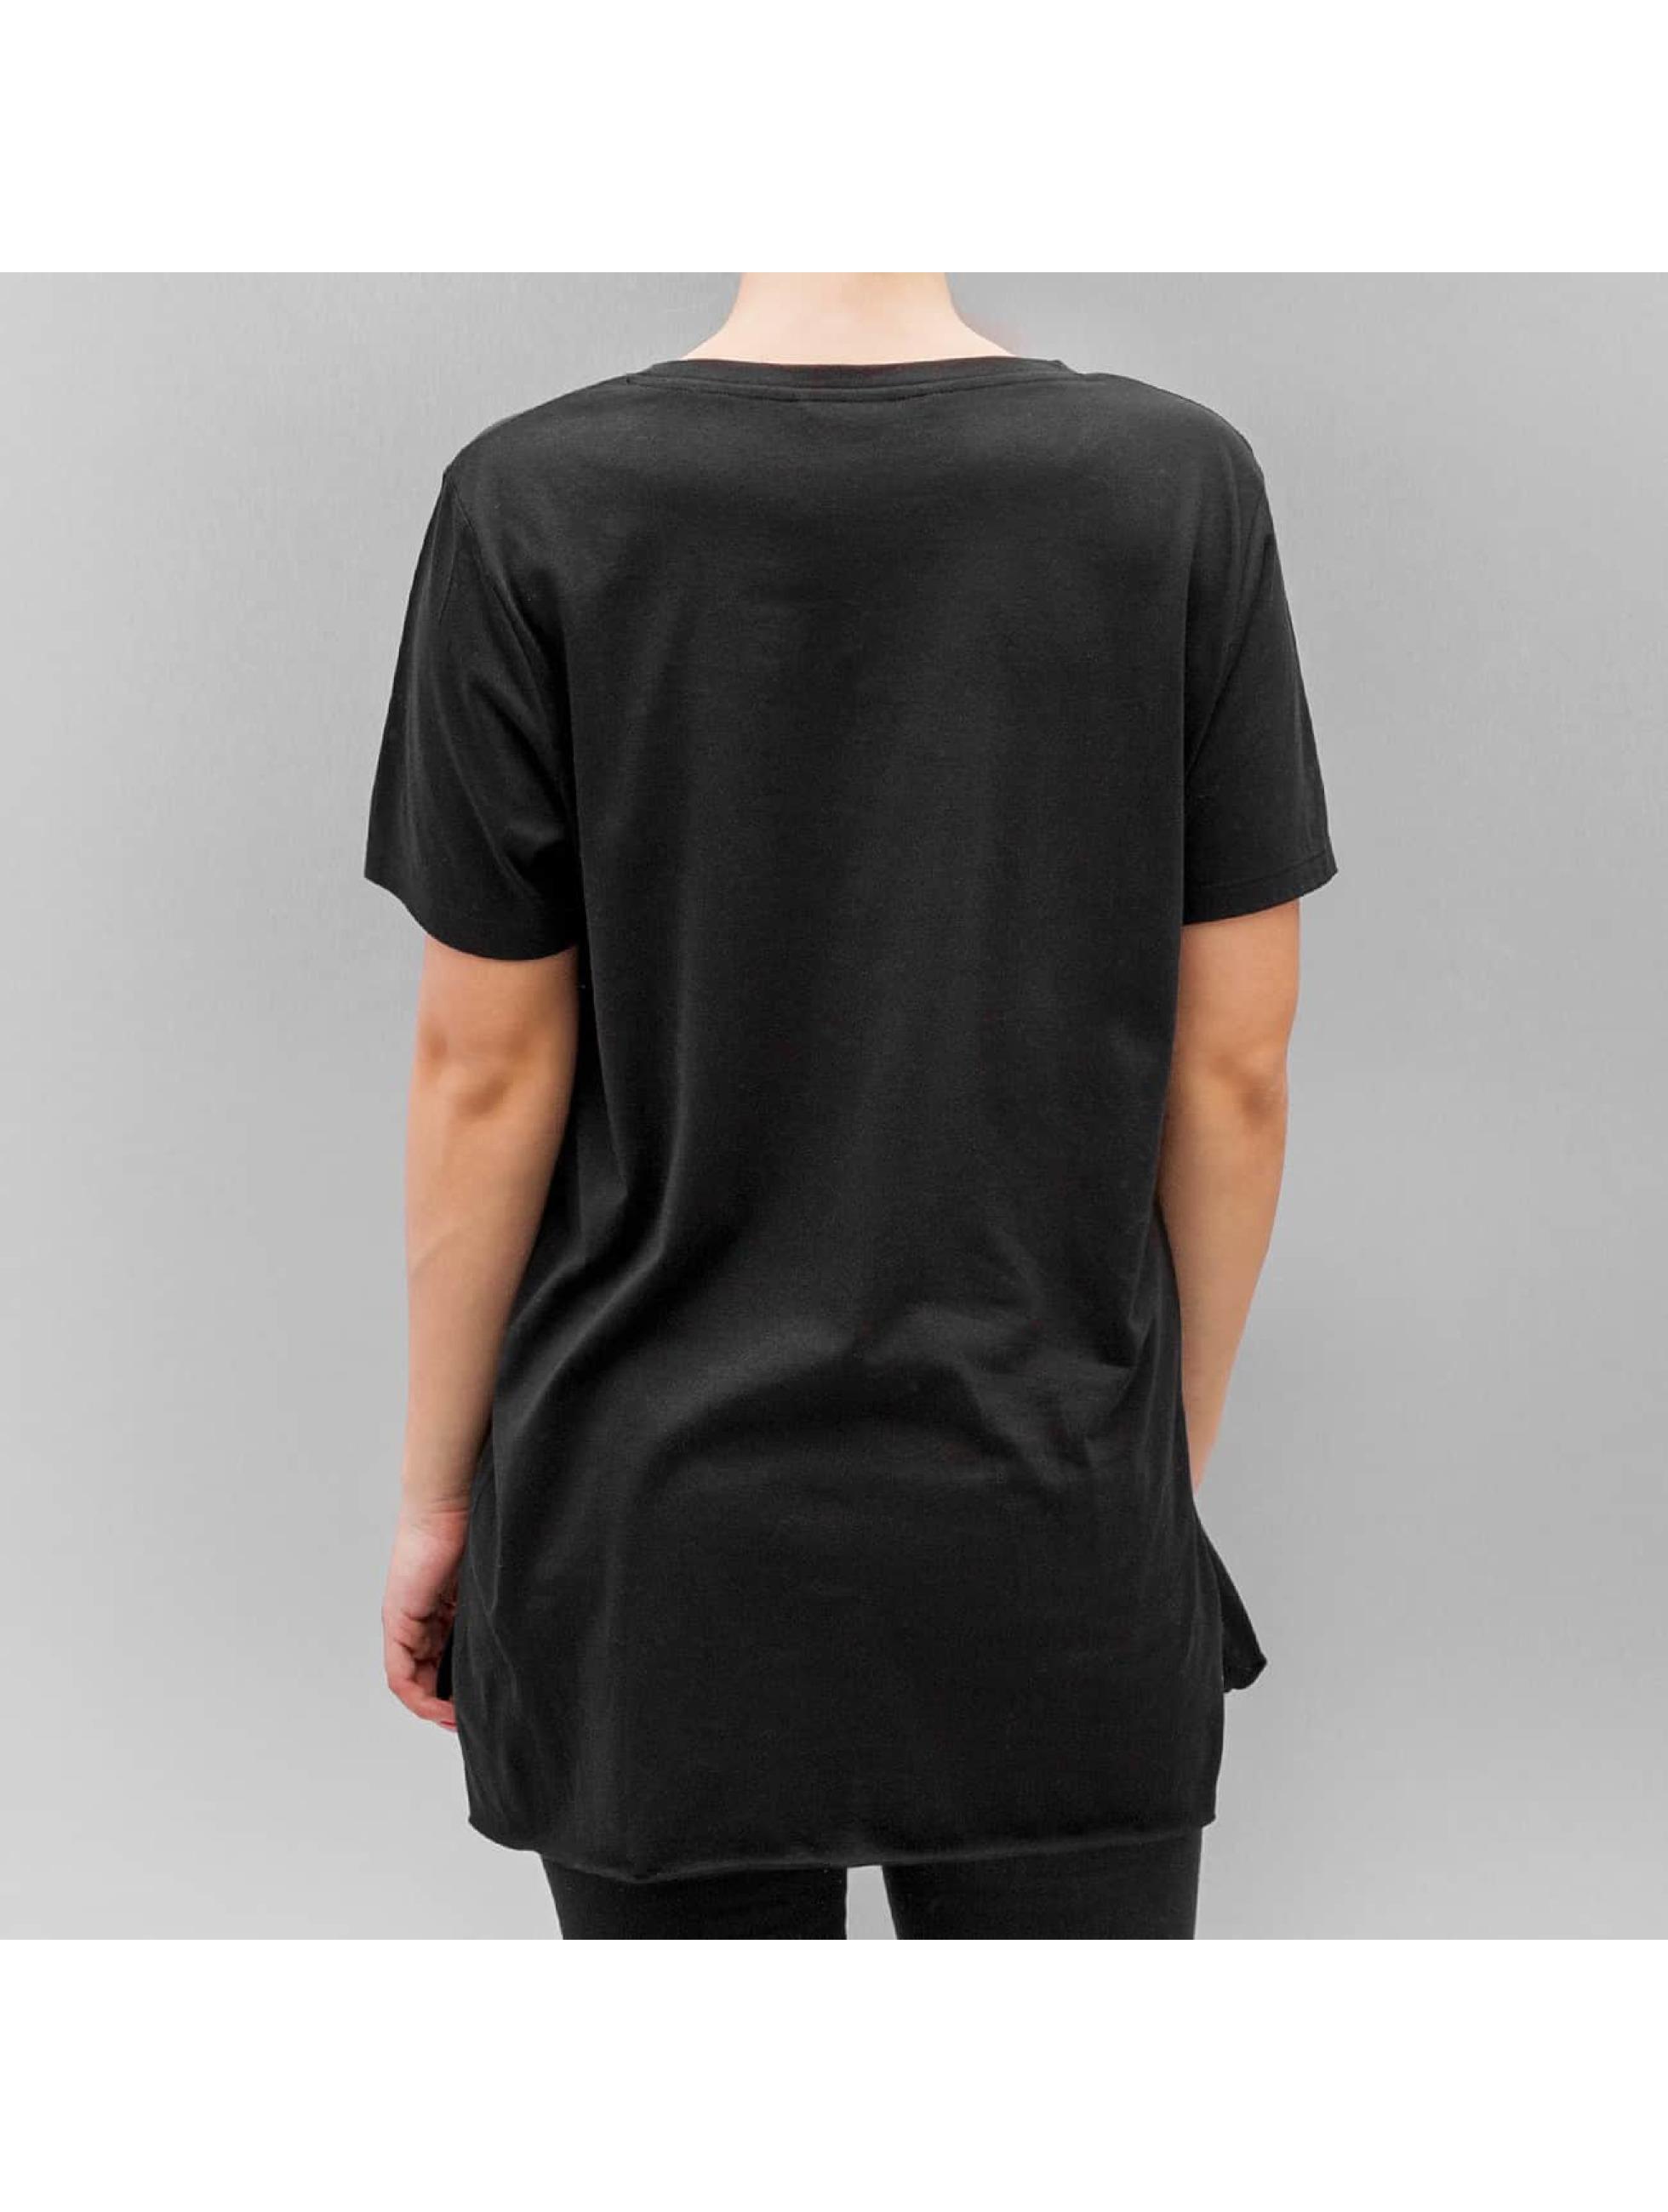 O'NEILL T-Shirt Jacks Base Brand schwarz